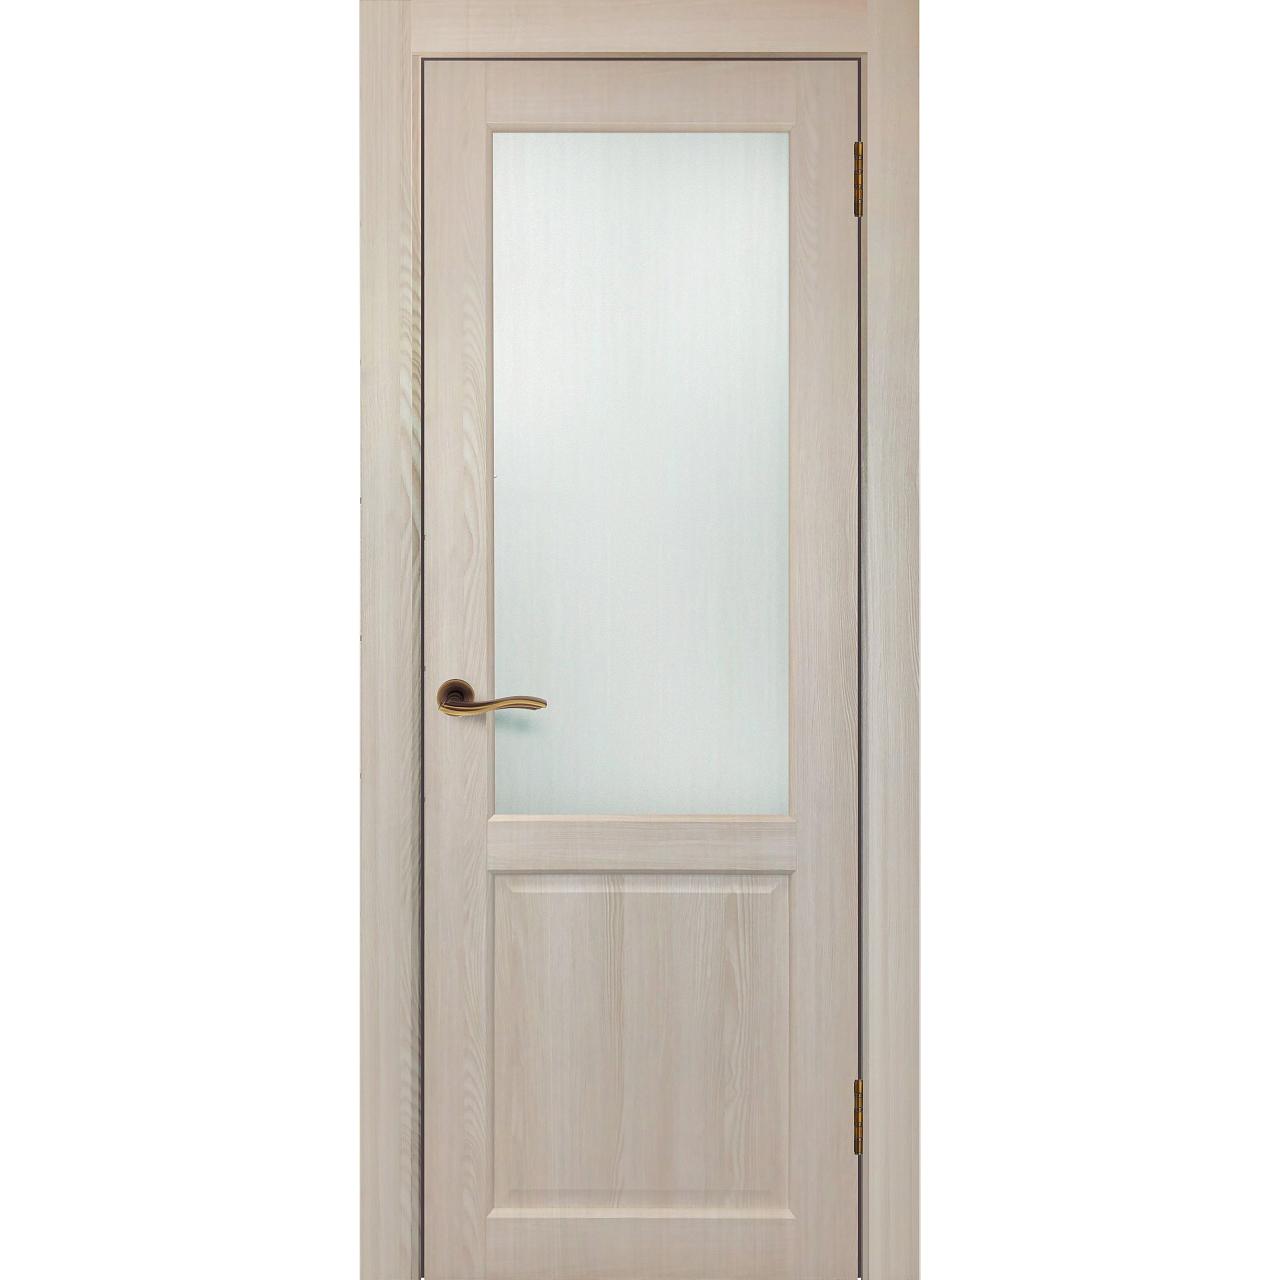 Межкомнатная дверь экошпон «Матрикс МК-7» стекло сатинато